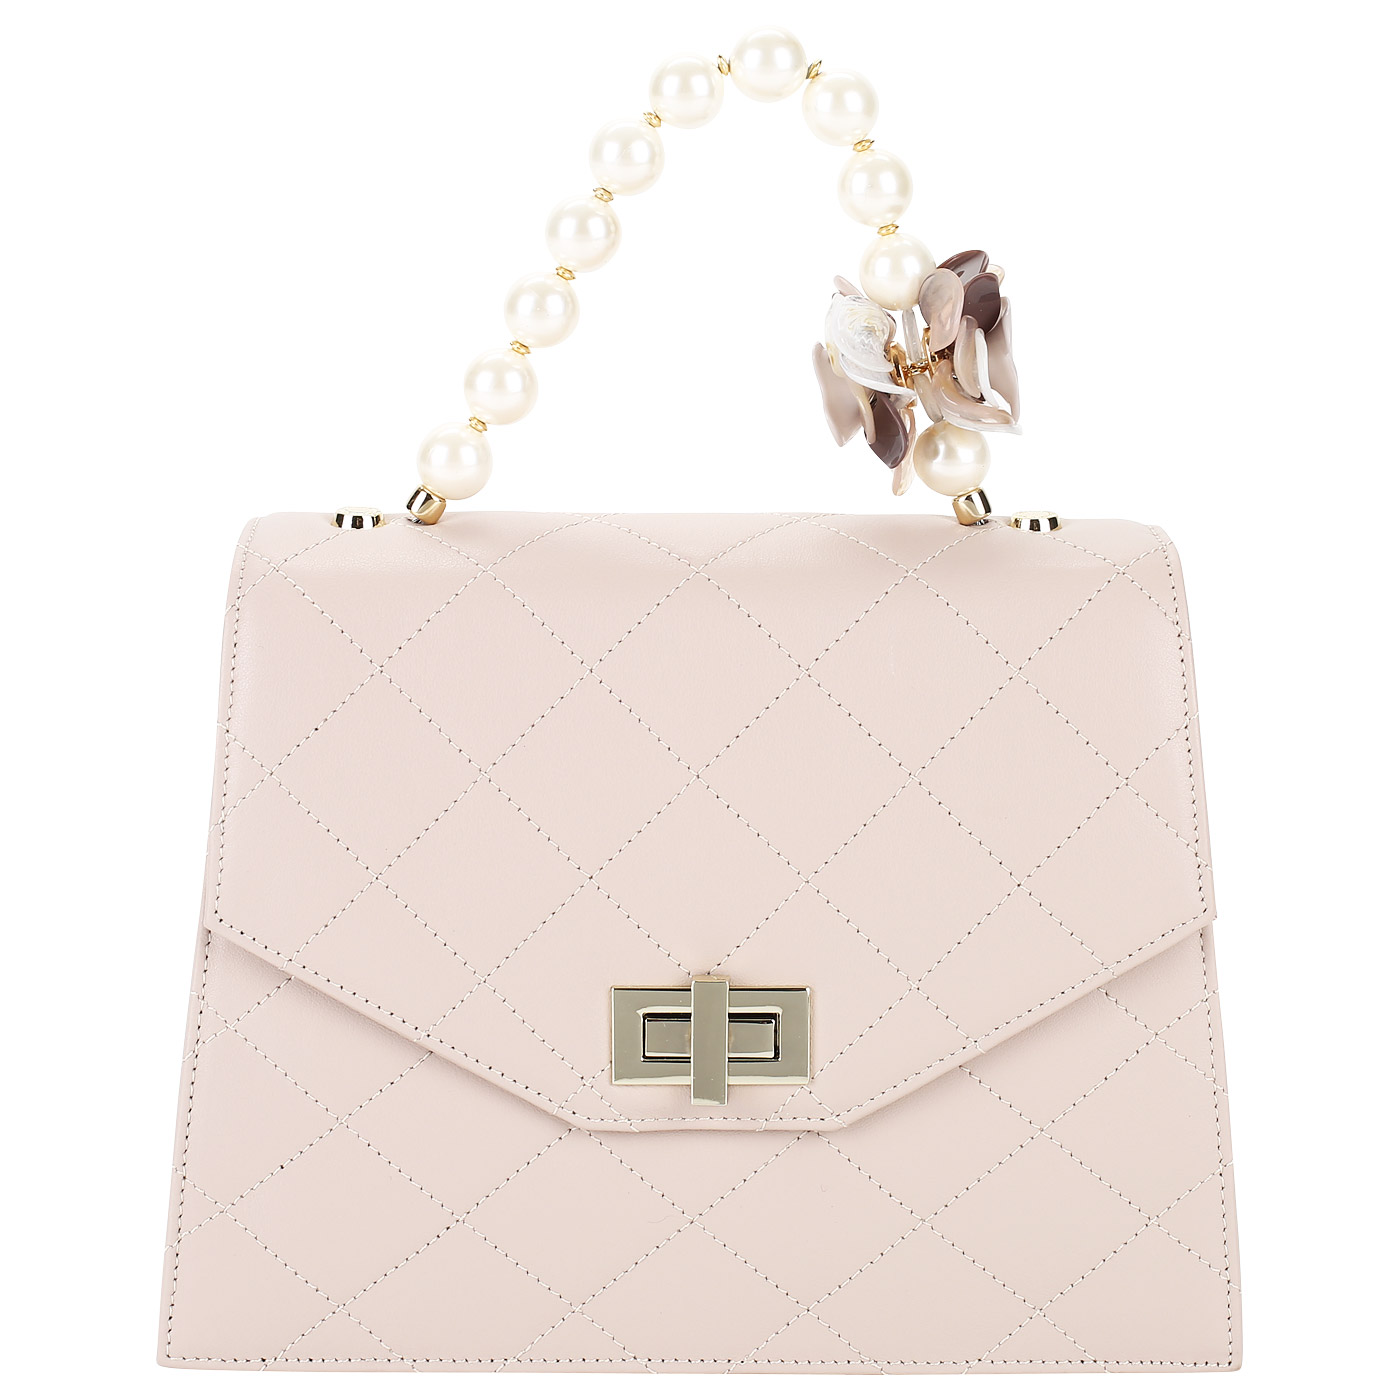 94266e3fd9cc Розовая сумочка из кожи Roberta Gandolfi Clara 1680_0008 ...